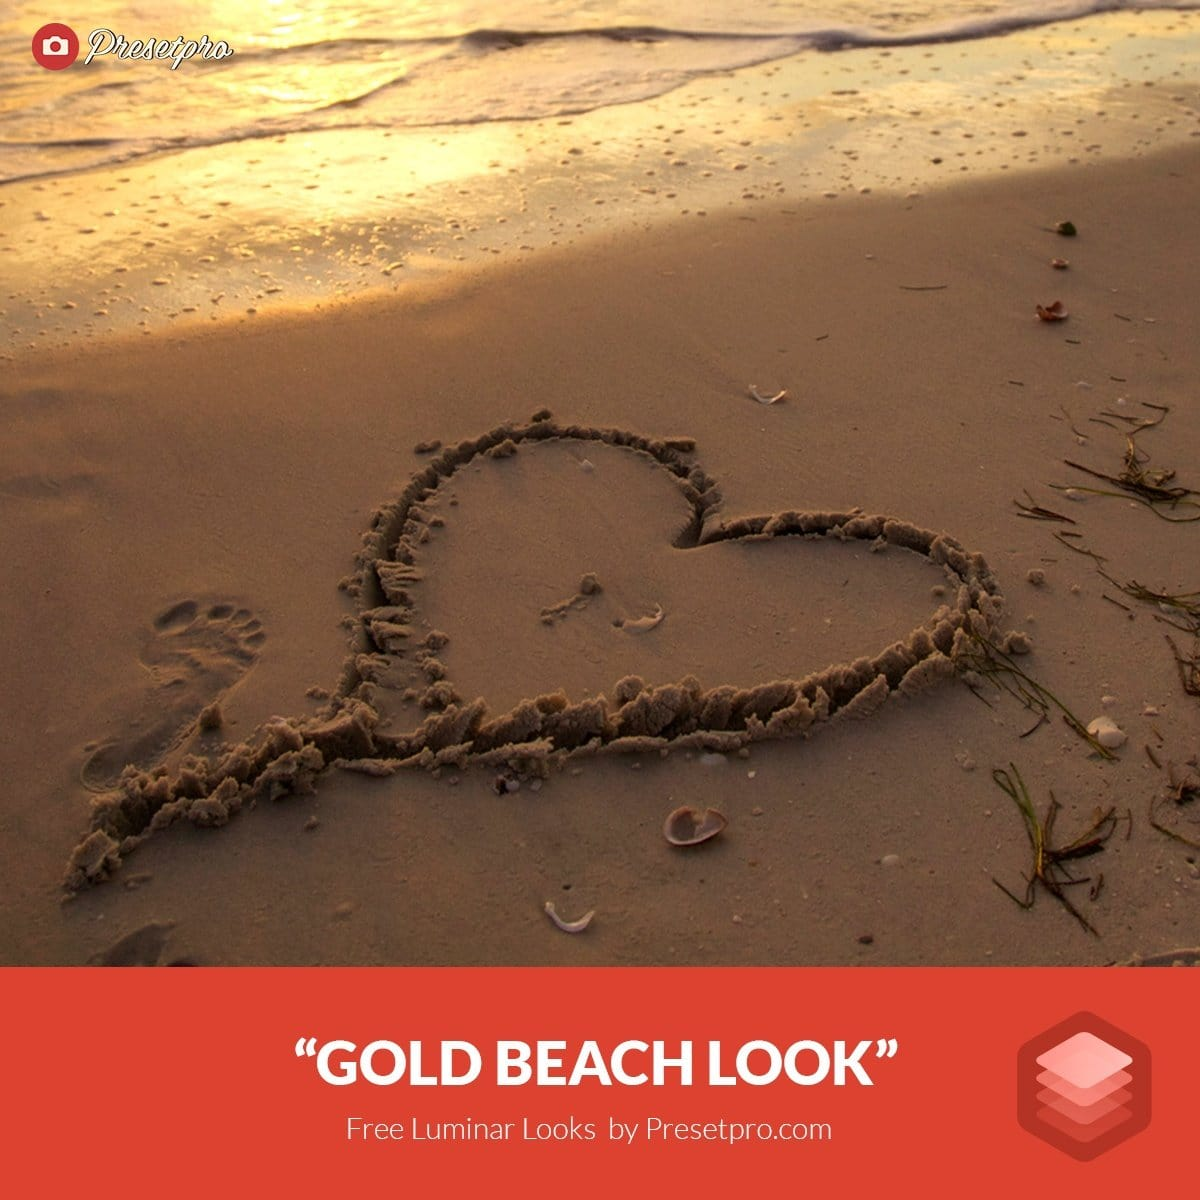 Free-Luminar-Look-Golden-Beach-Preset-Presetpro.com